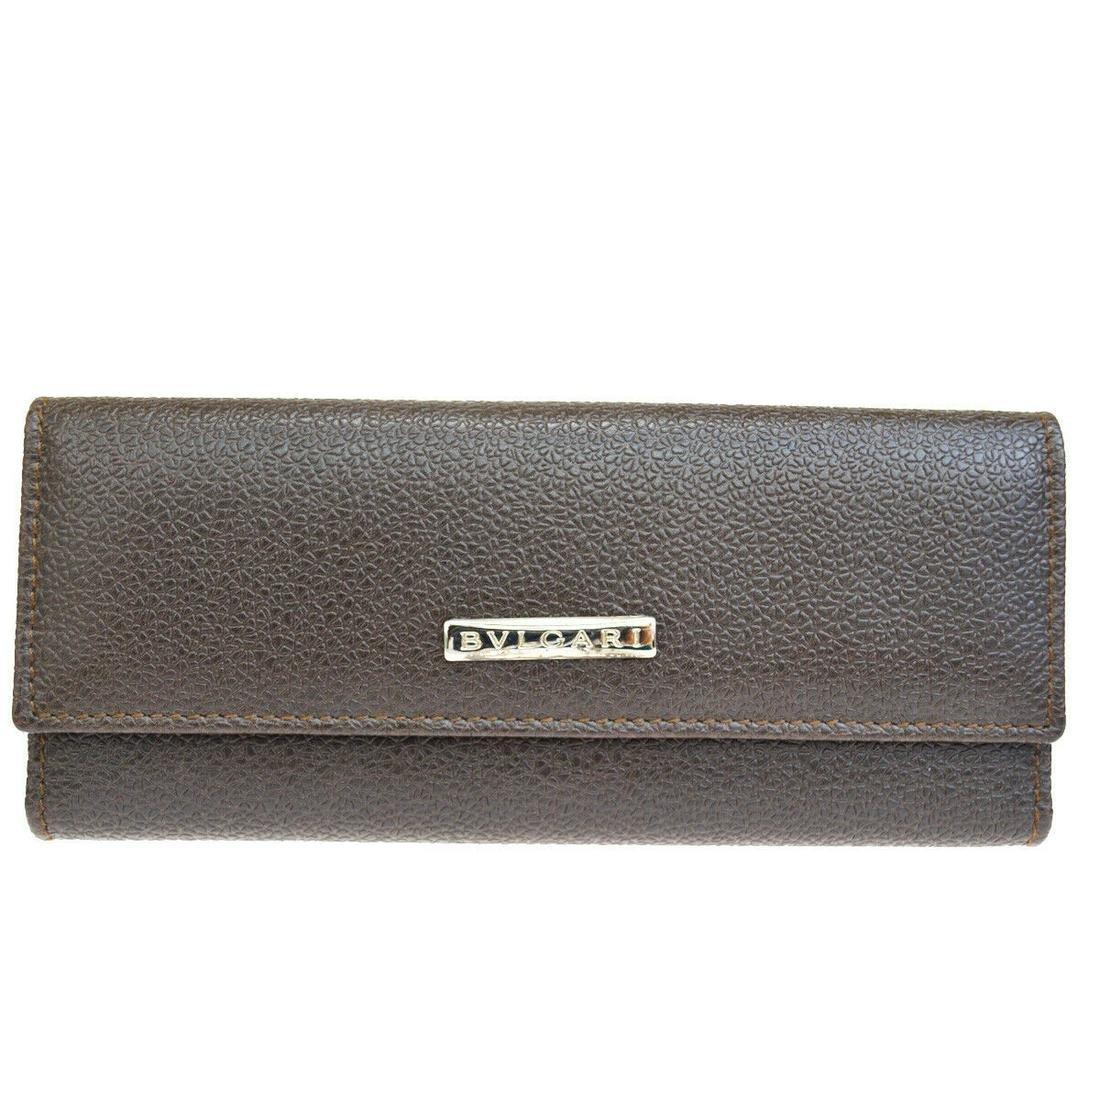 Authentic BVLGARI Leather Key Case